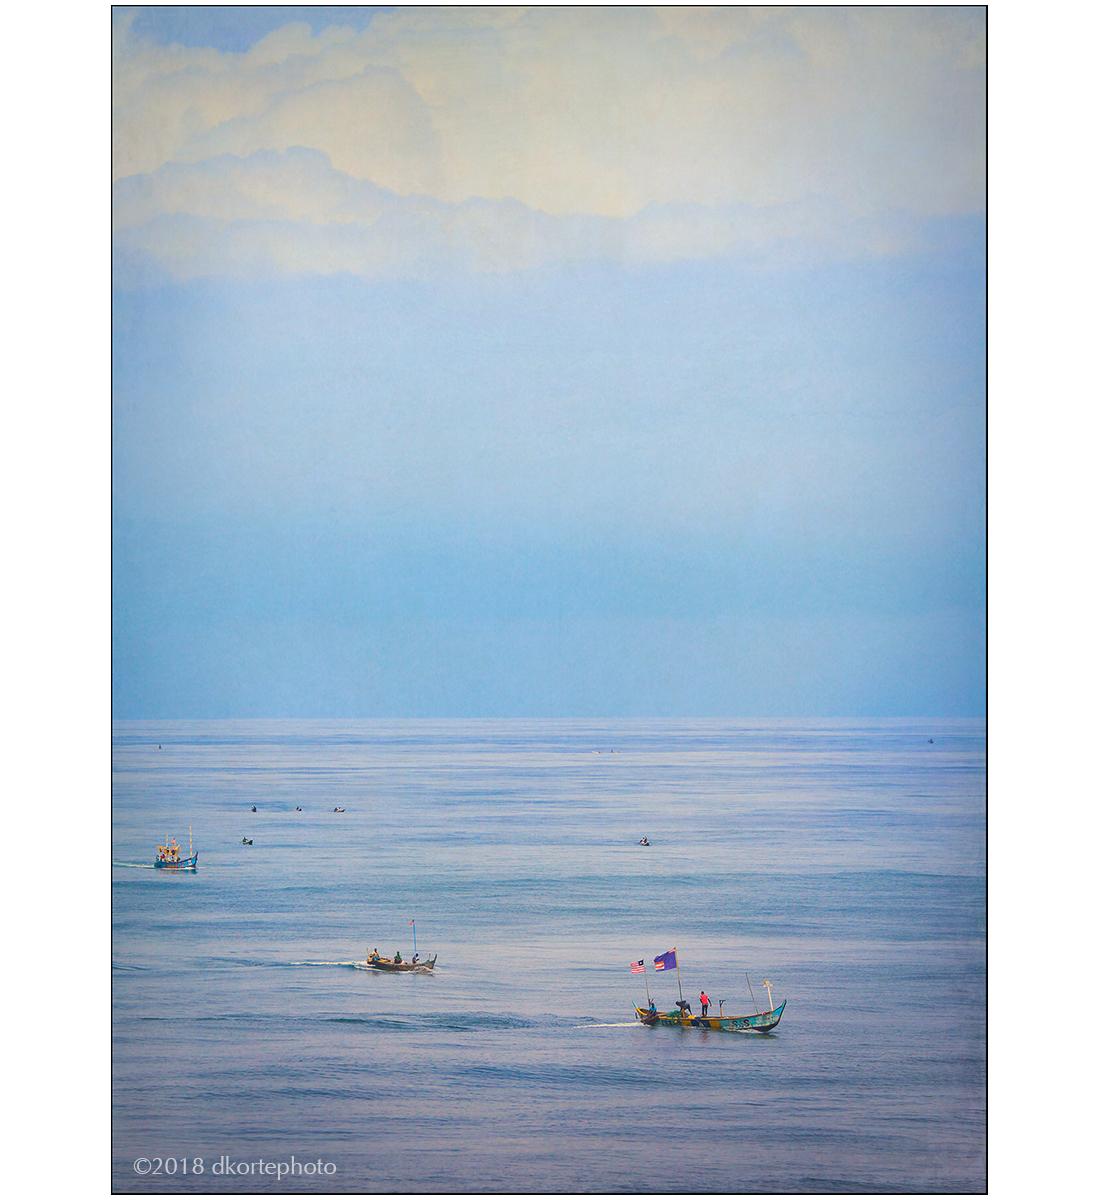 CanoesVertical_DKortephoto